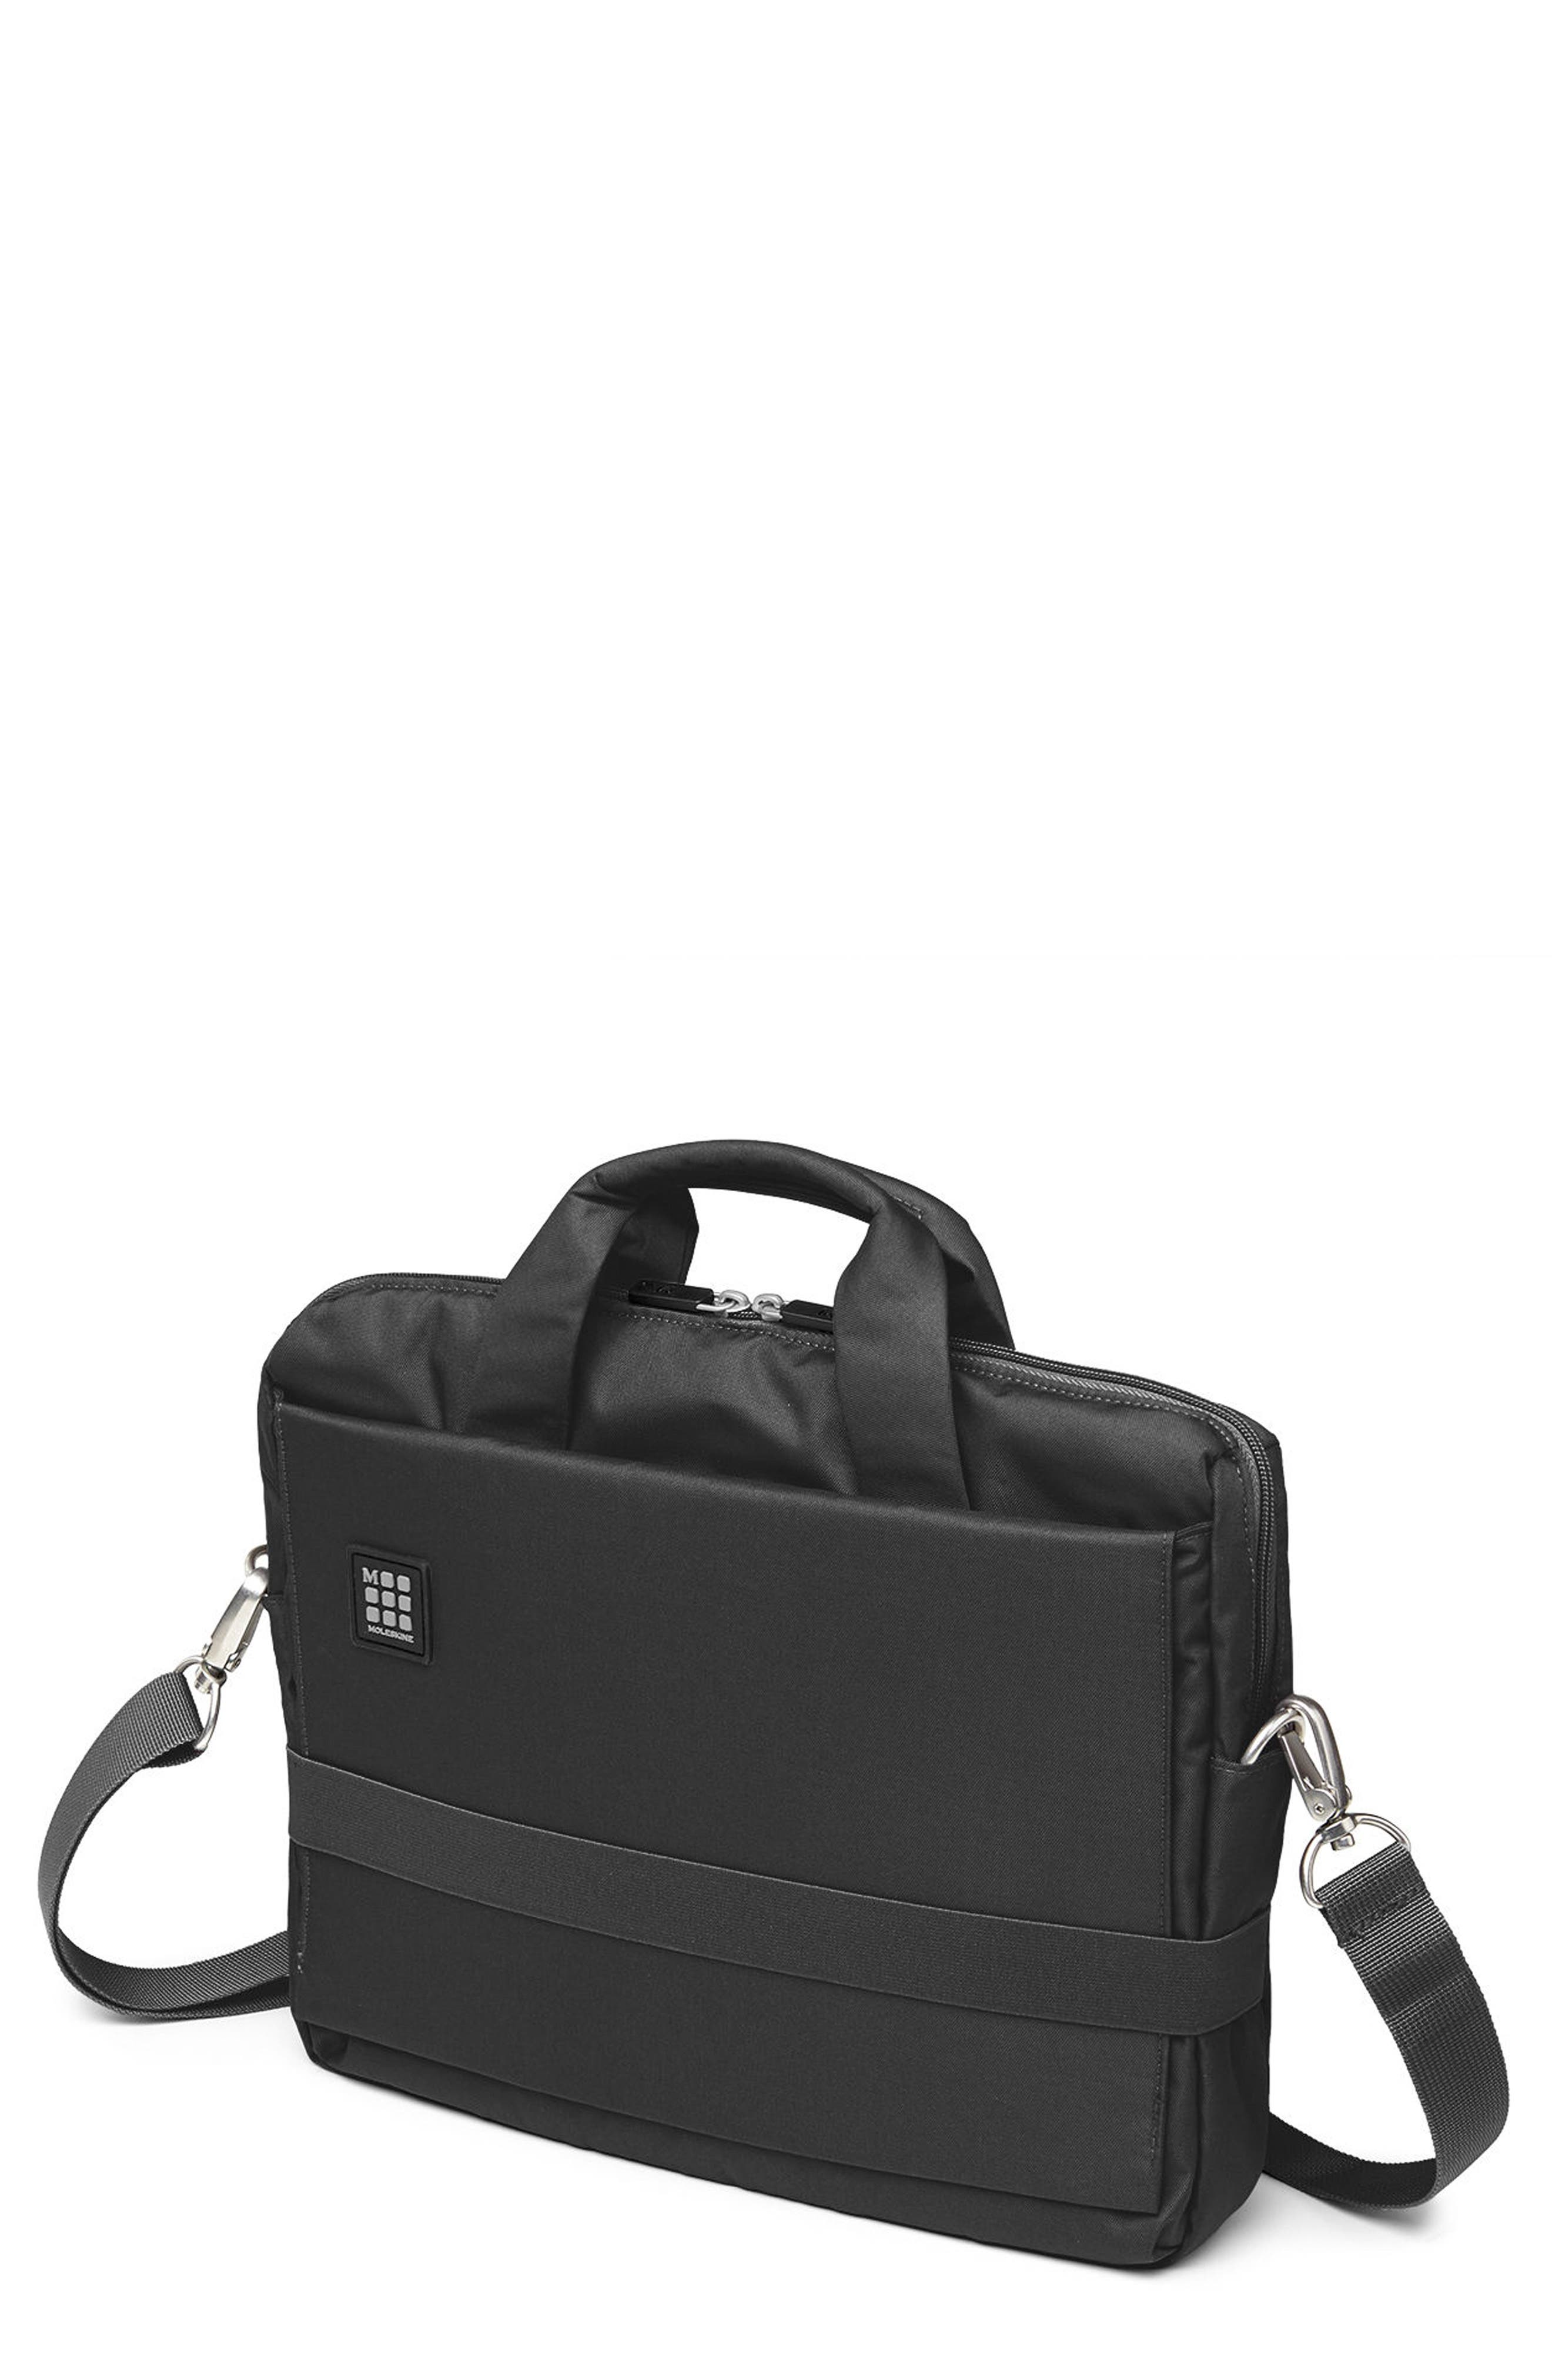 Horizontal Device Bag,                             Main thumbnail 1, color,                             001